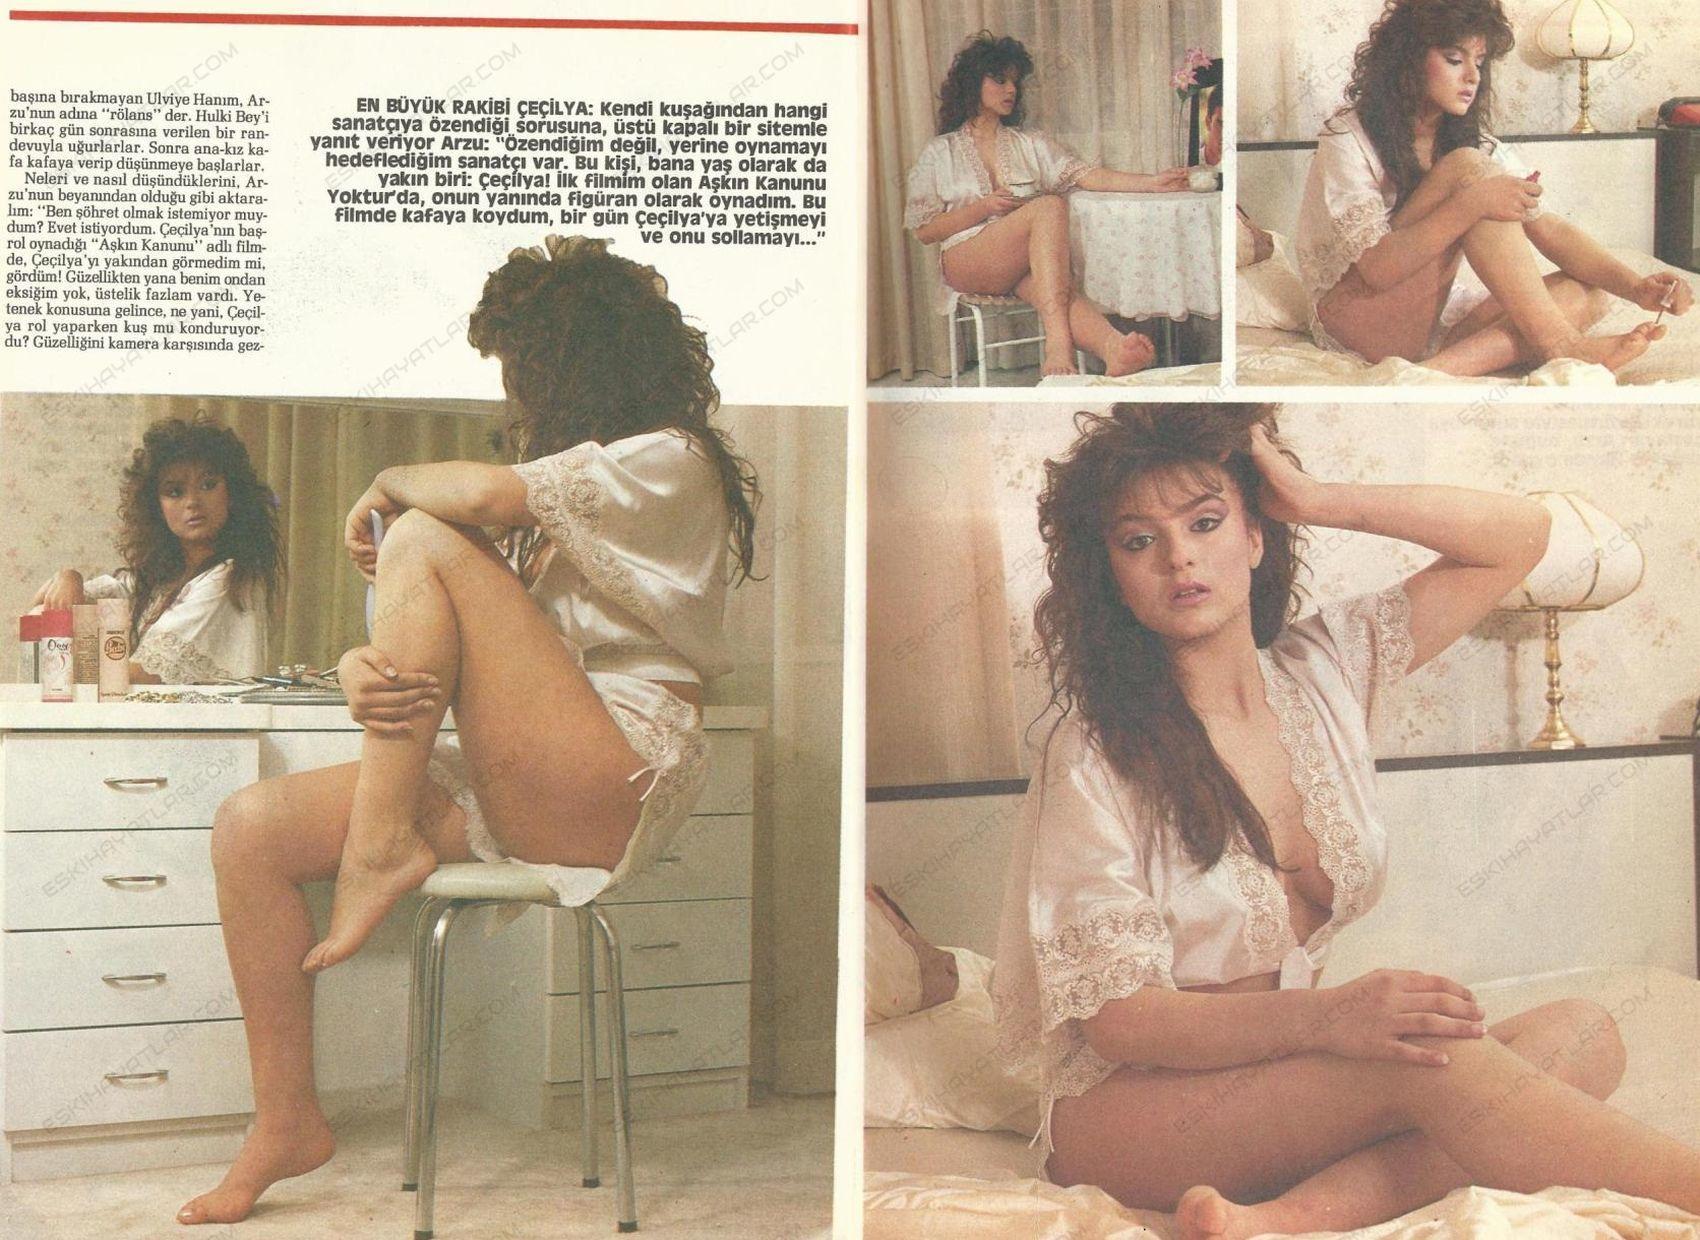 0323-arzu-caglayan-roportaji-1987-erkekce-dergisi (7)